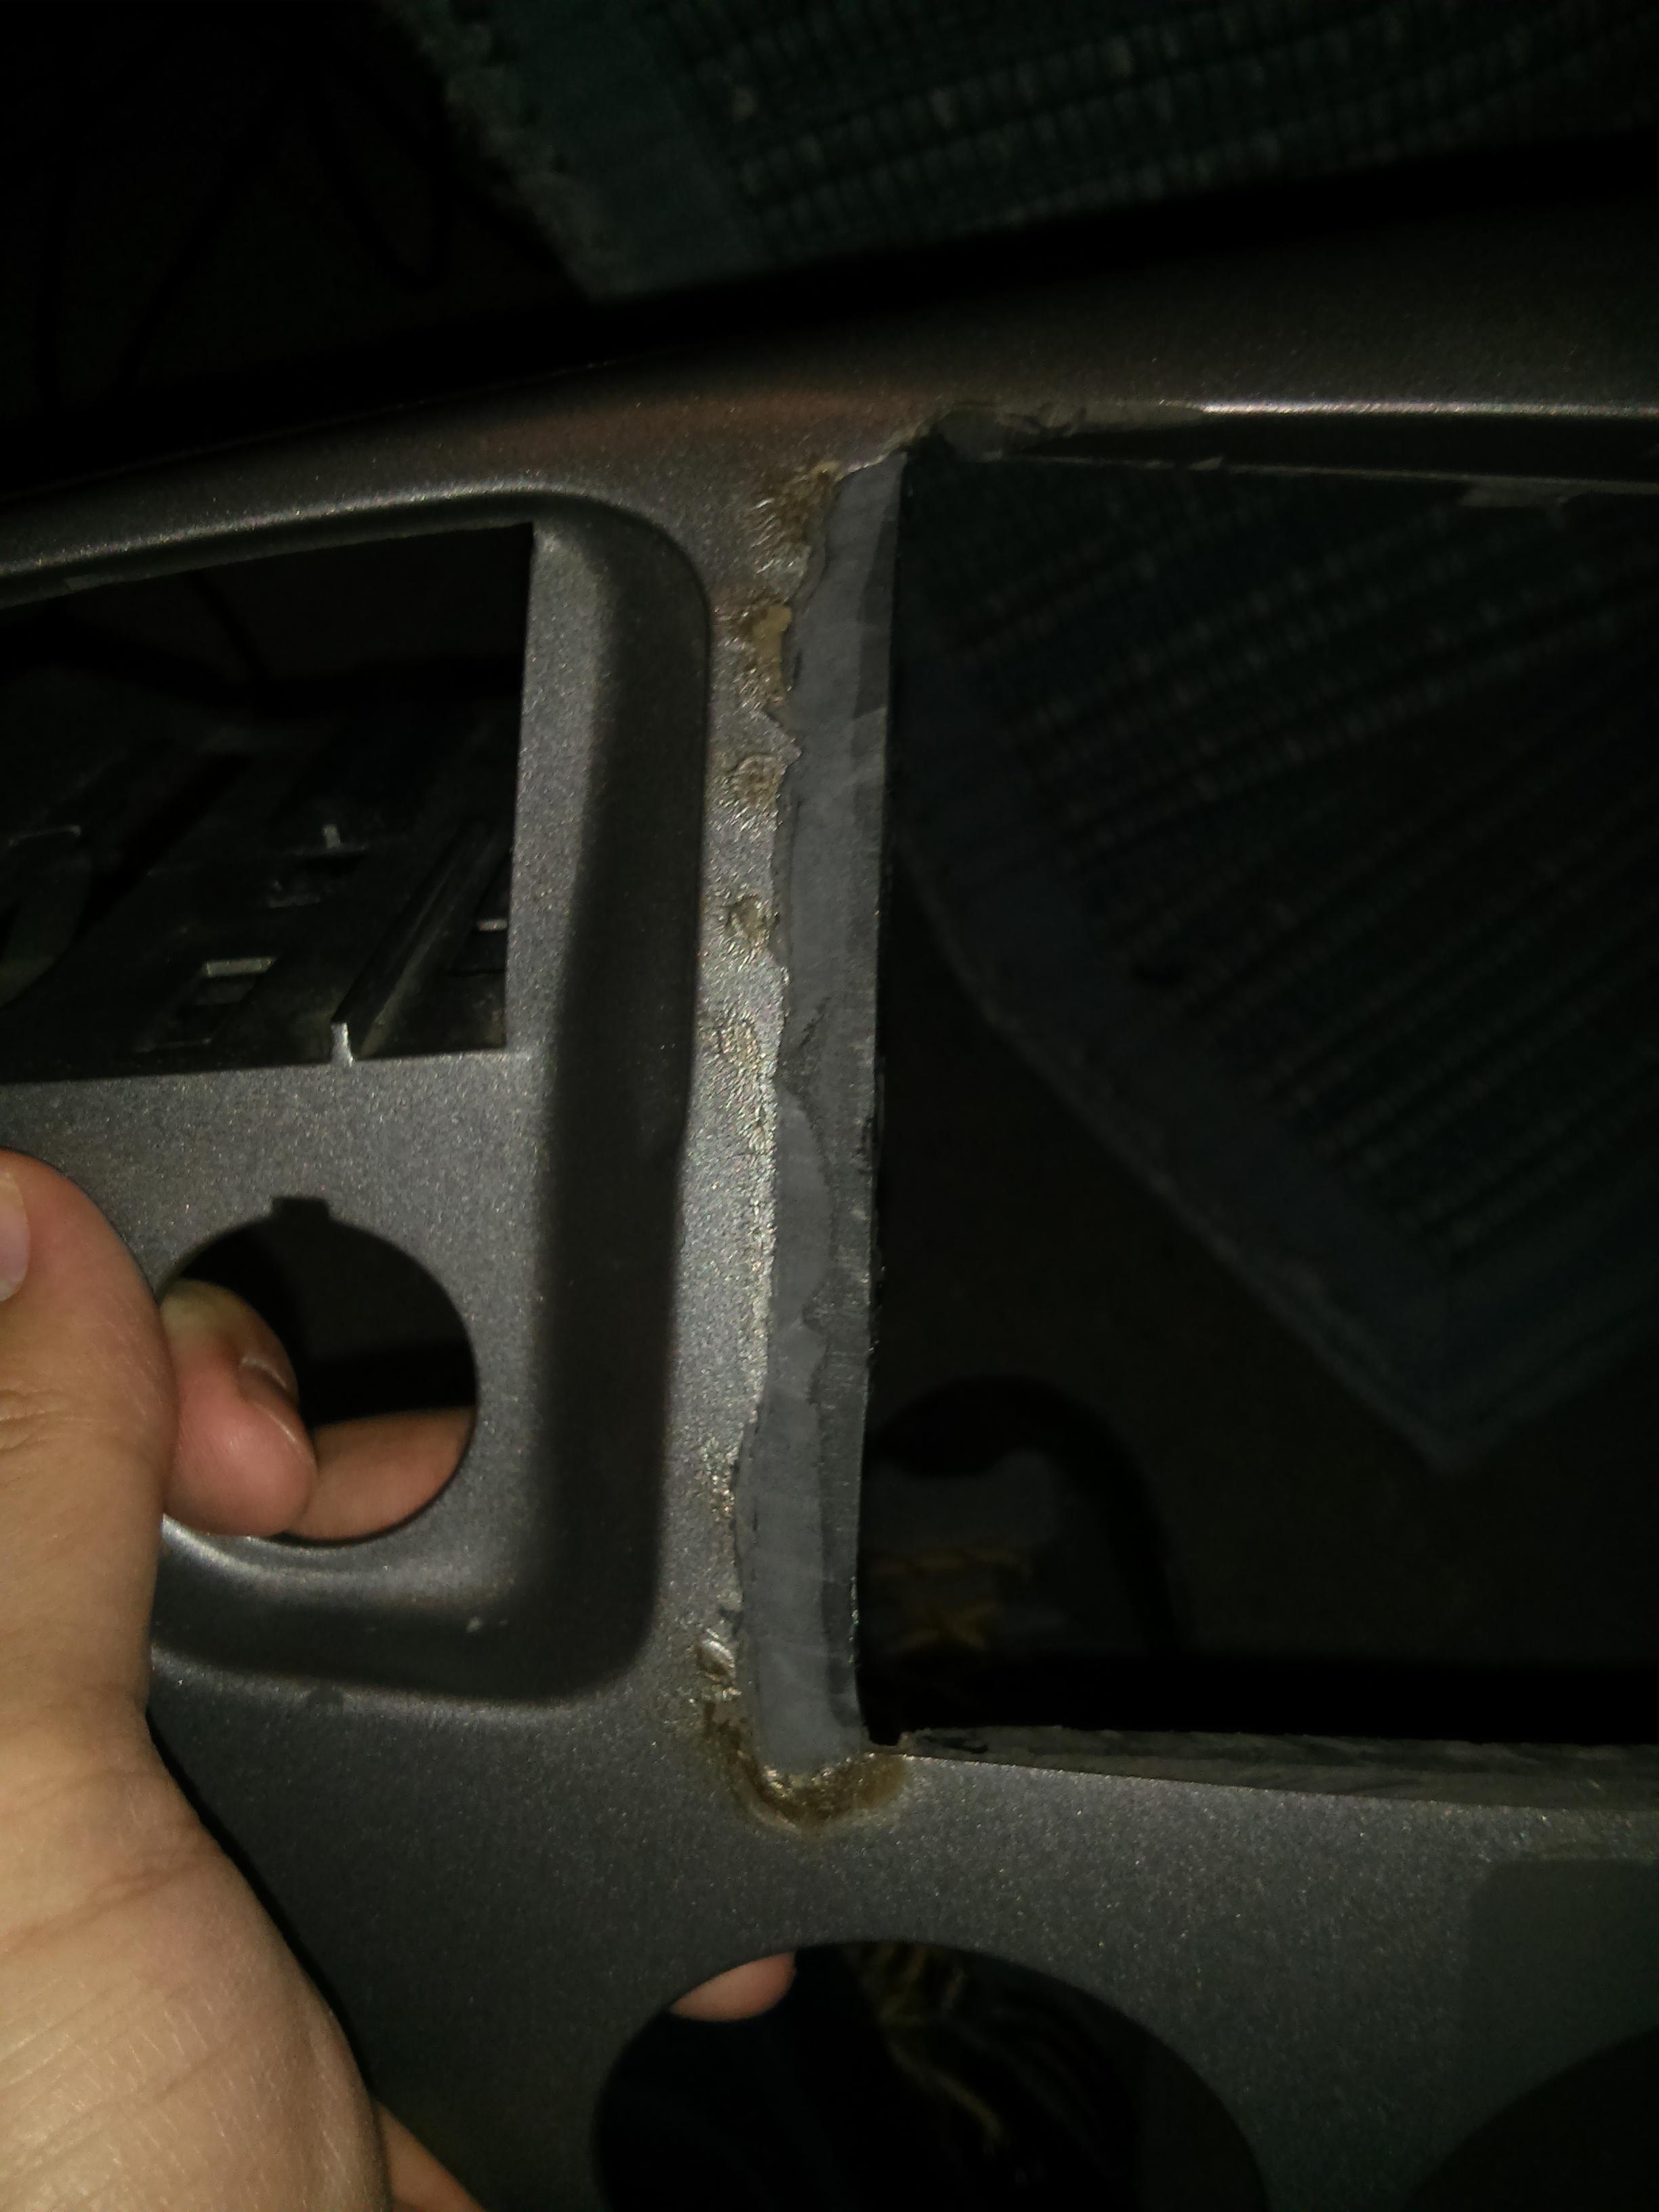 Delovi ford focus tddi tdci kompletan auto u delovima - Slika